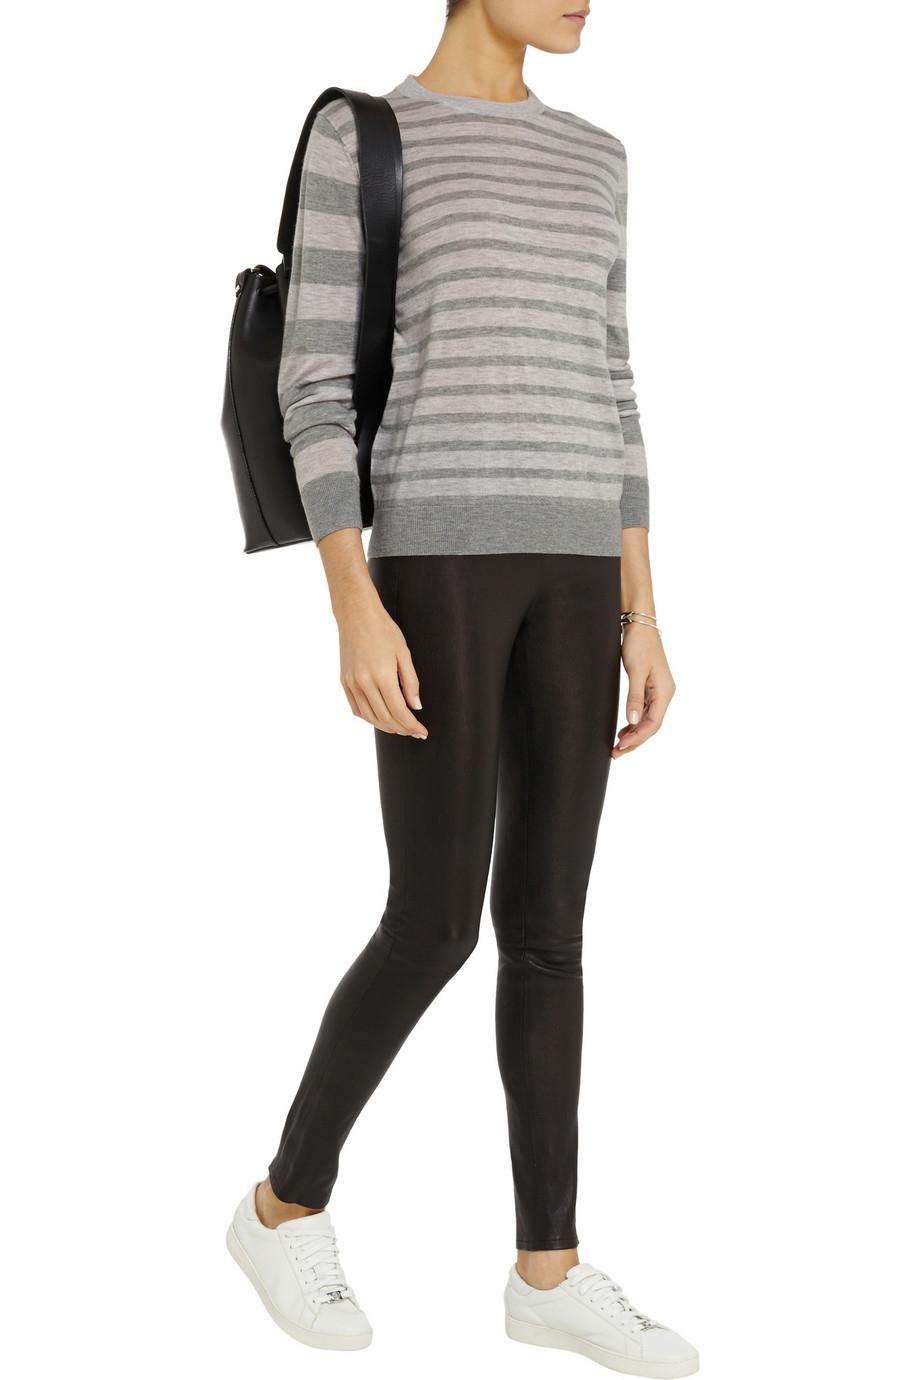 Iris & ink Lola Striped Cashmere Sweater in Gray